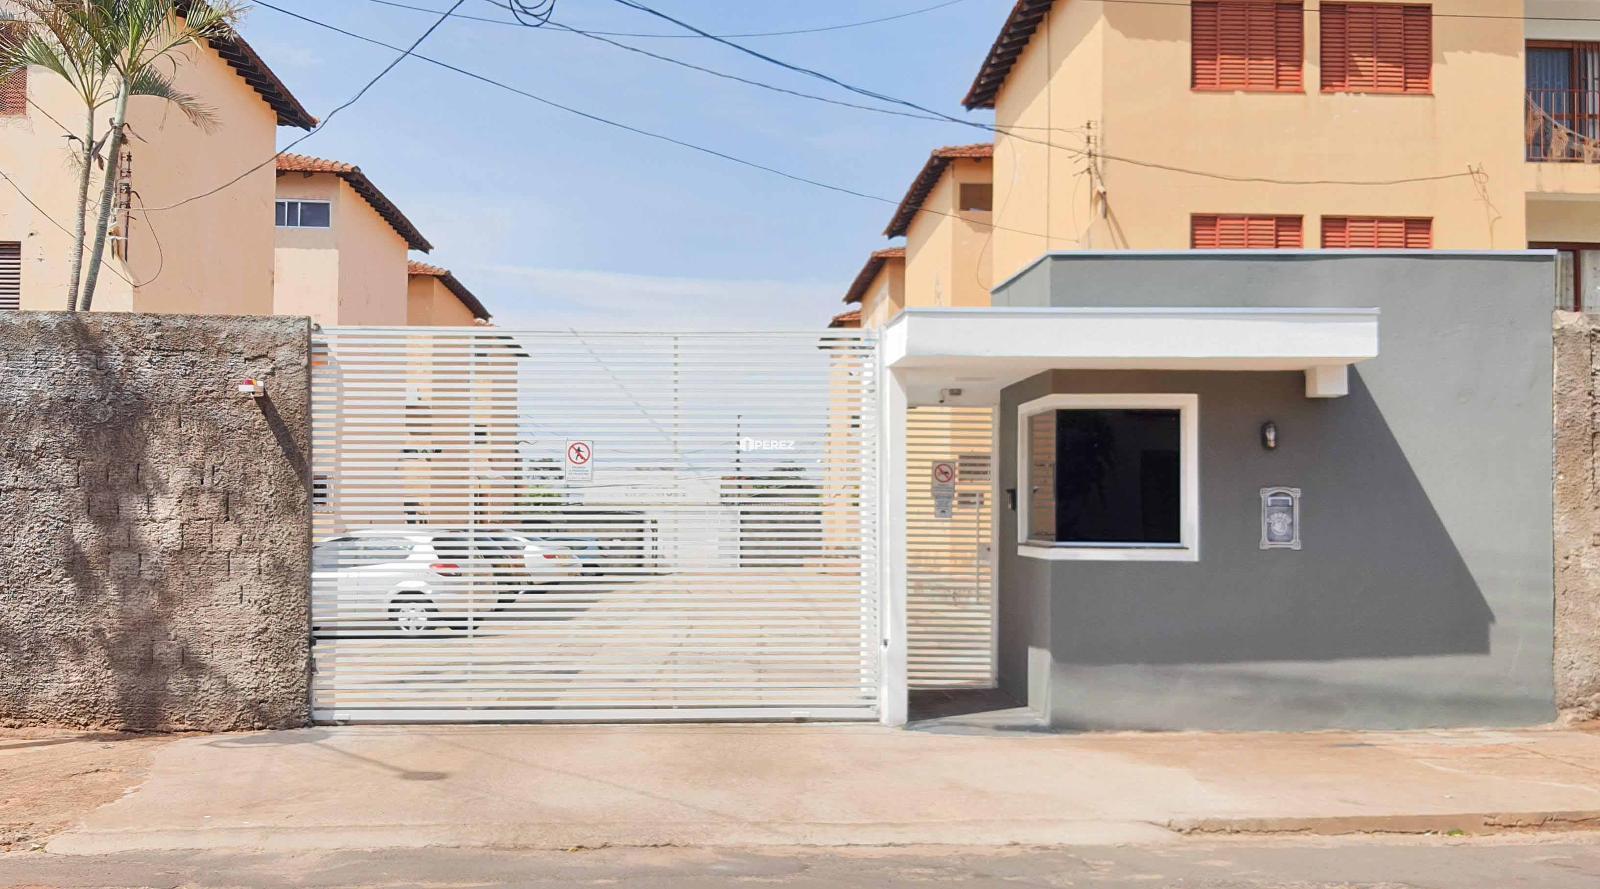 aluguel-campo-grande-ms-apartamento-avenida-bandeirantes-guanandi-perez-imoveis